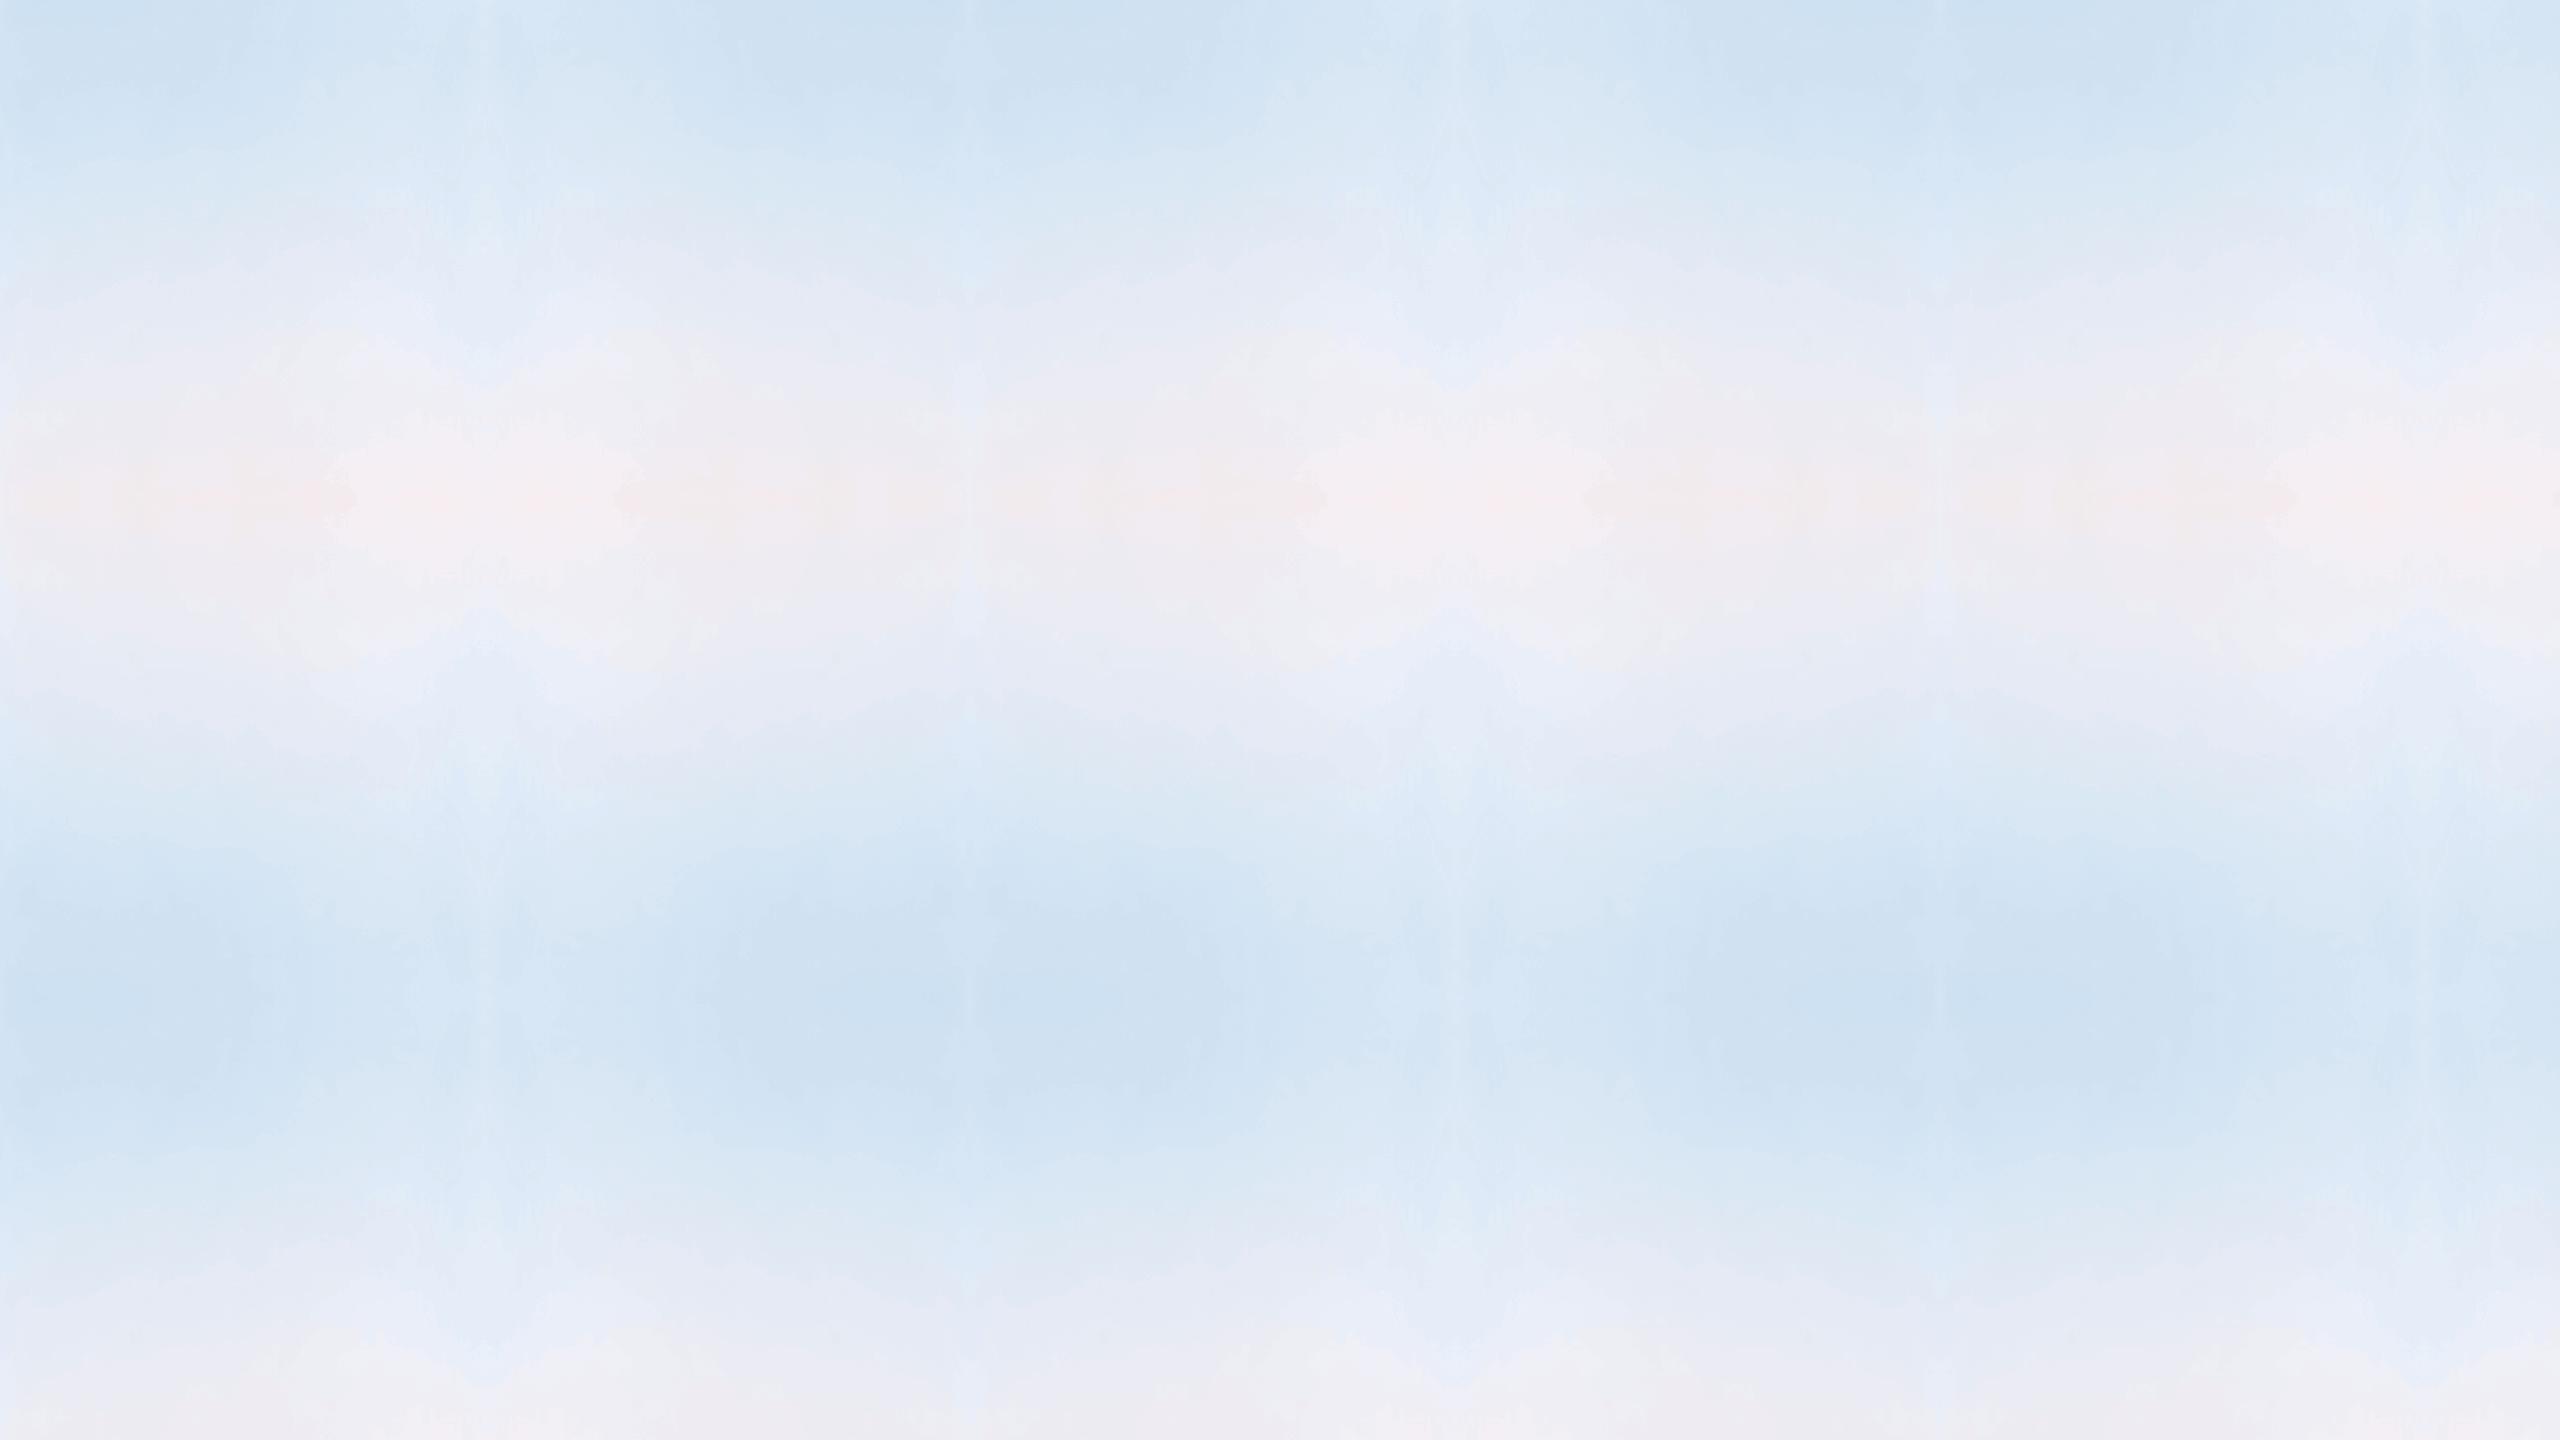 Download 430 Koleksi Wallpaper Tumblr Blue Pastel HD Gratid